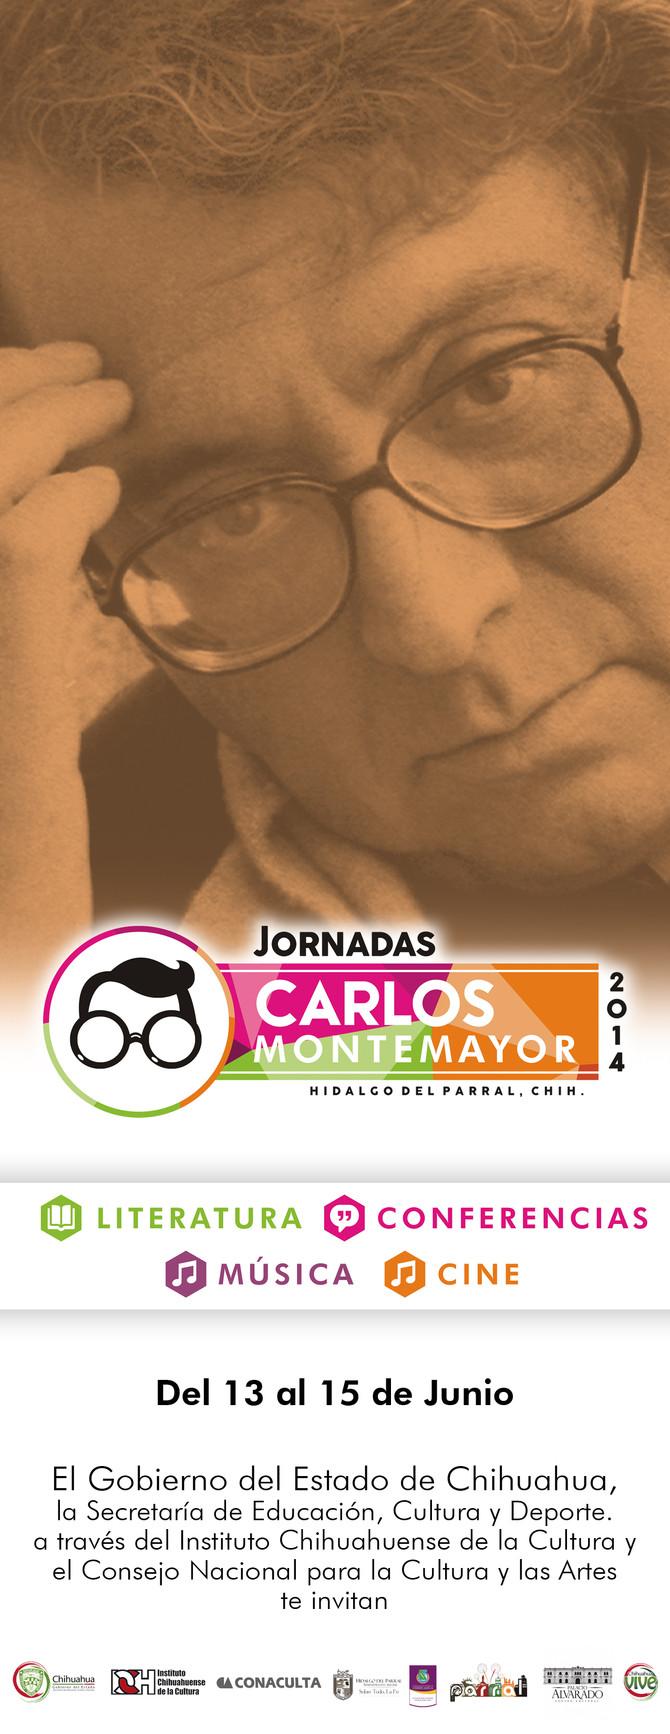 Jornadas Carlos Montemayor 2014